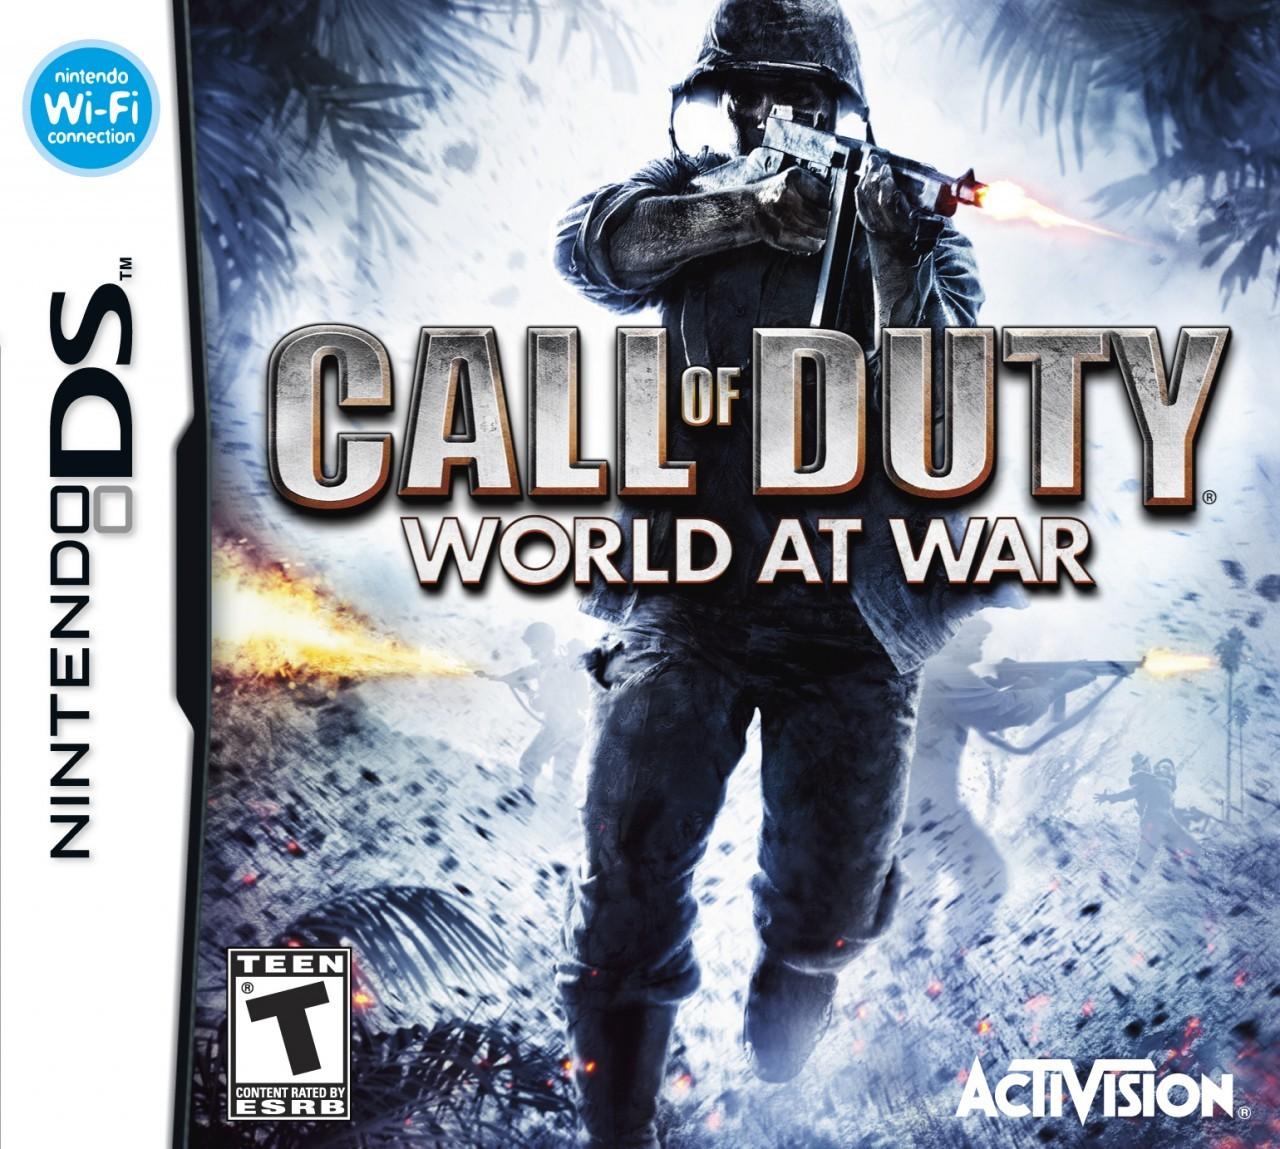 File:DS world at war.jpg